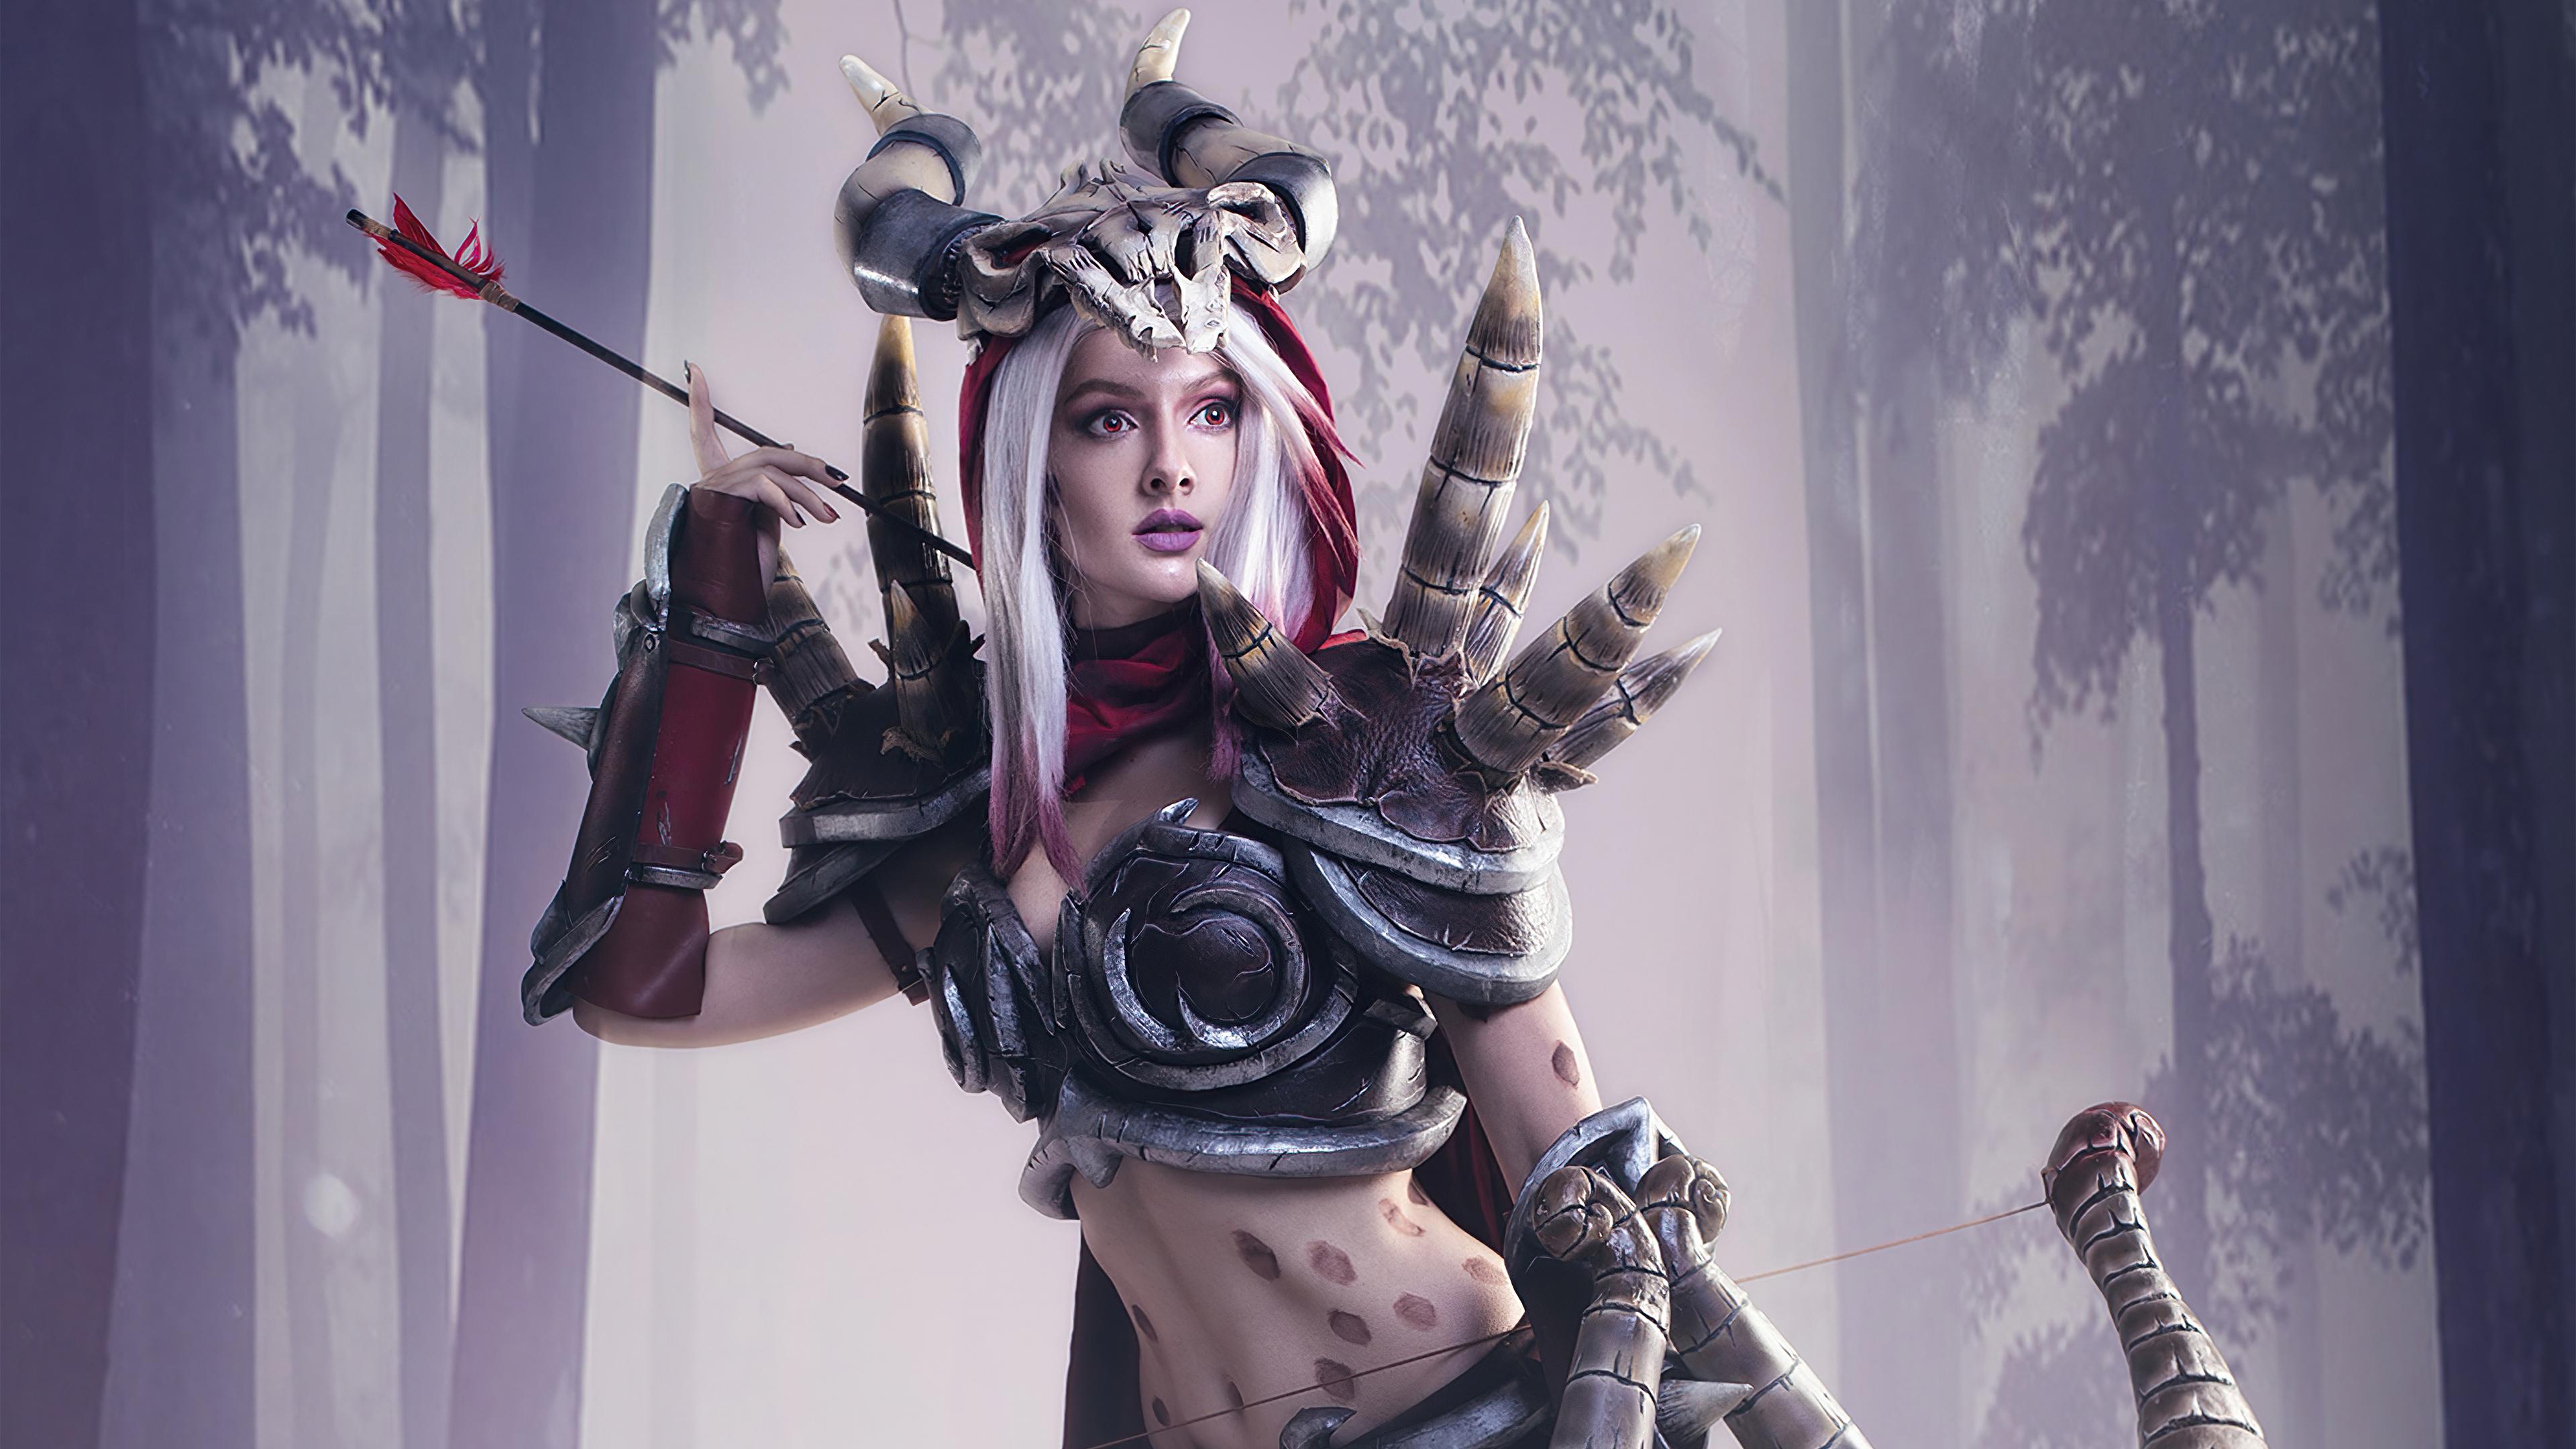 Fondos de pantalla Sylvanas Windrunner de Warcraft